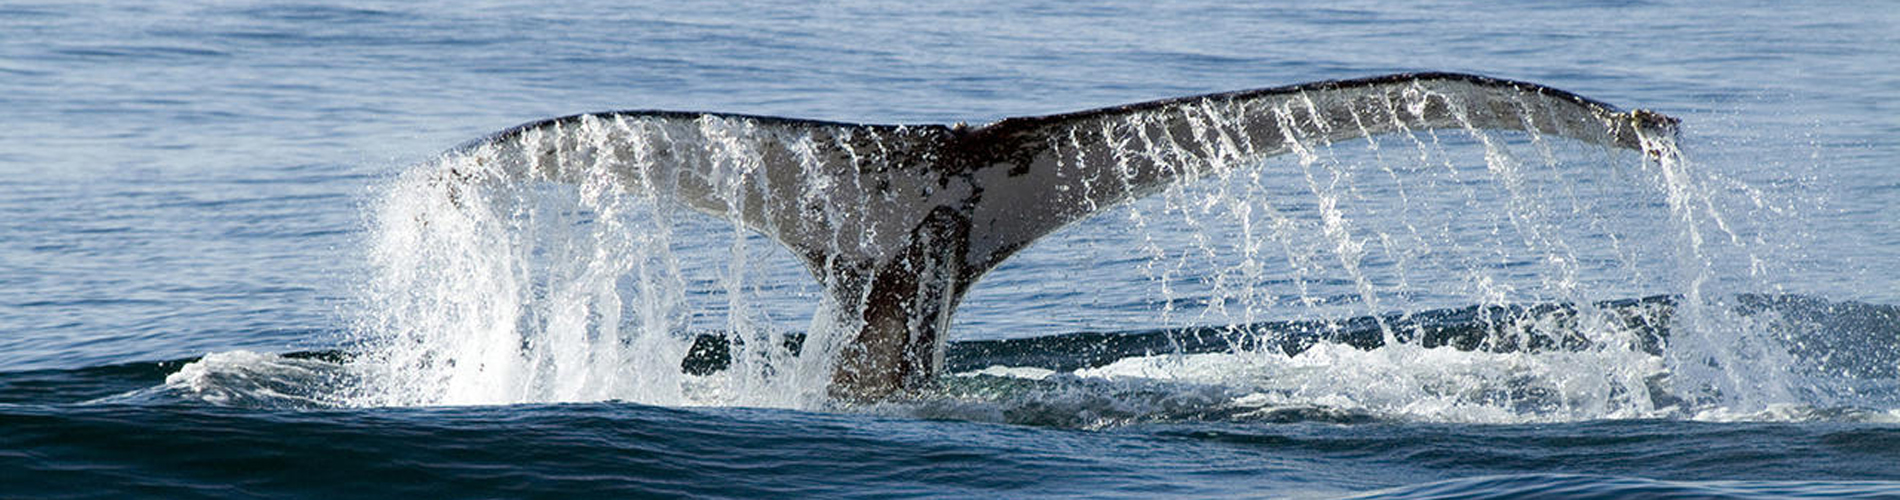 inspirational places mosaic whale rezied website